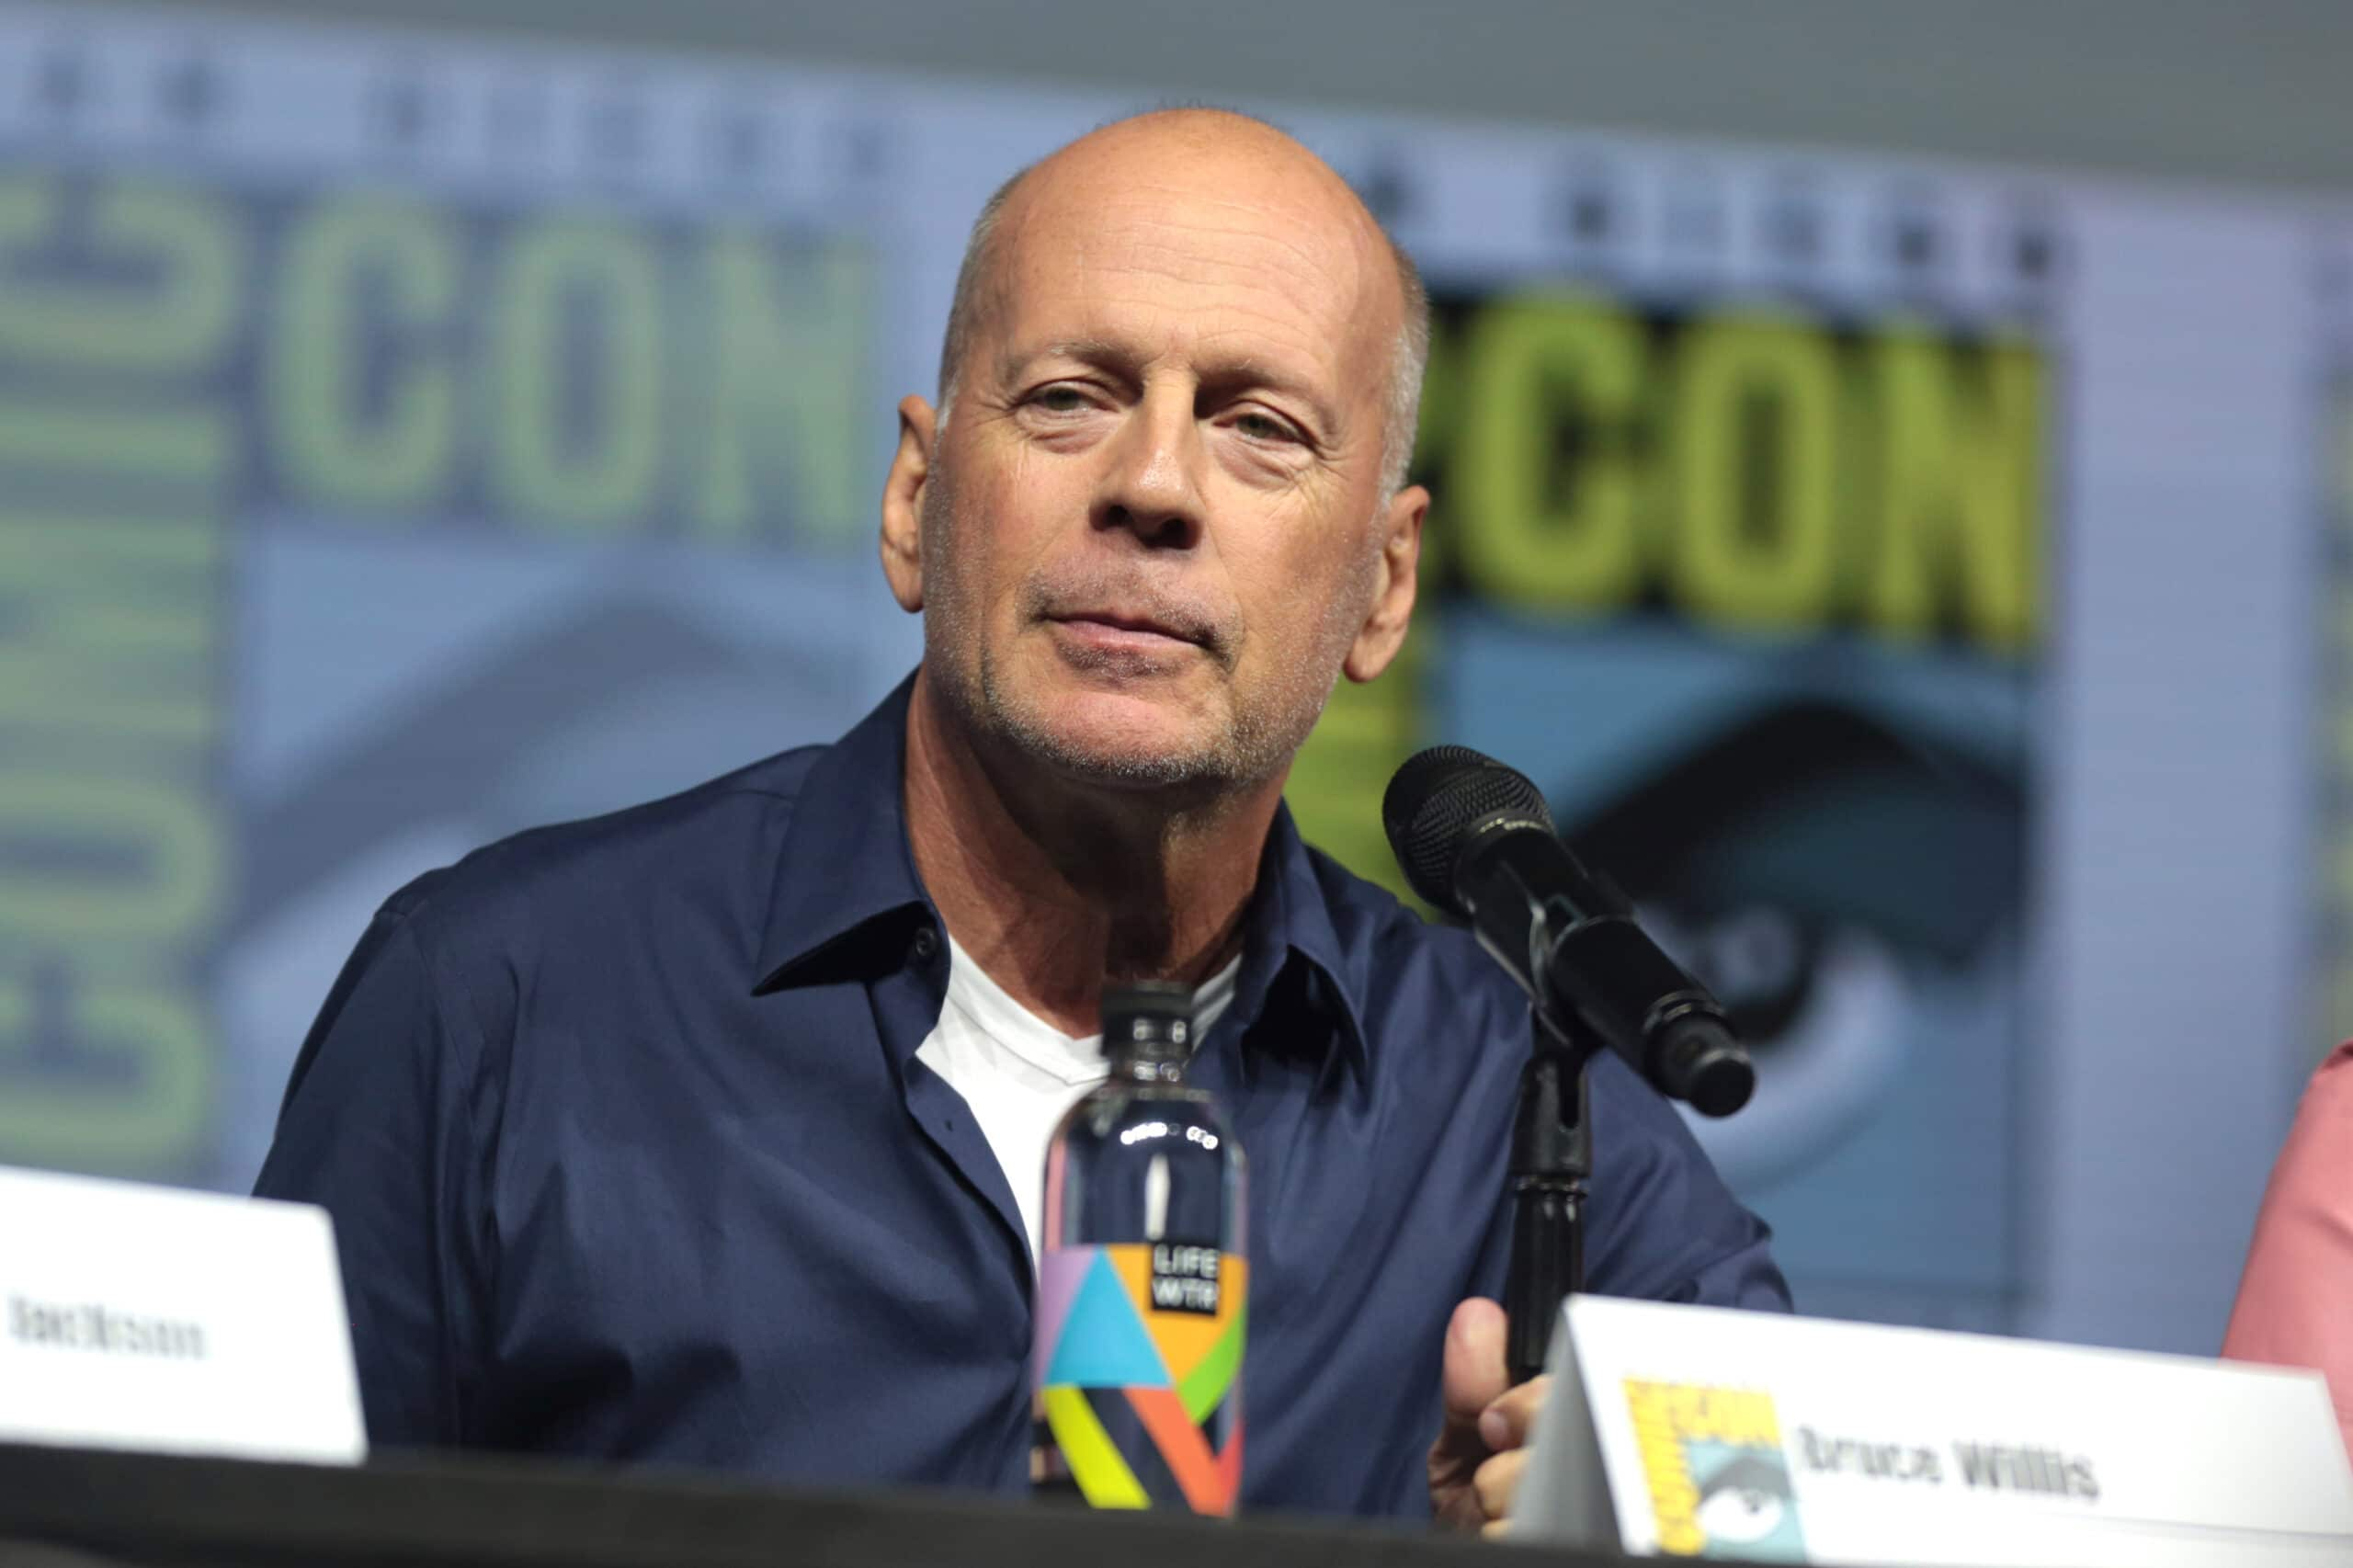 I migliori film di Bruce Willis